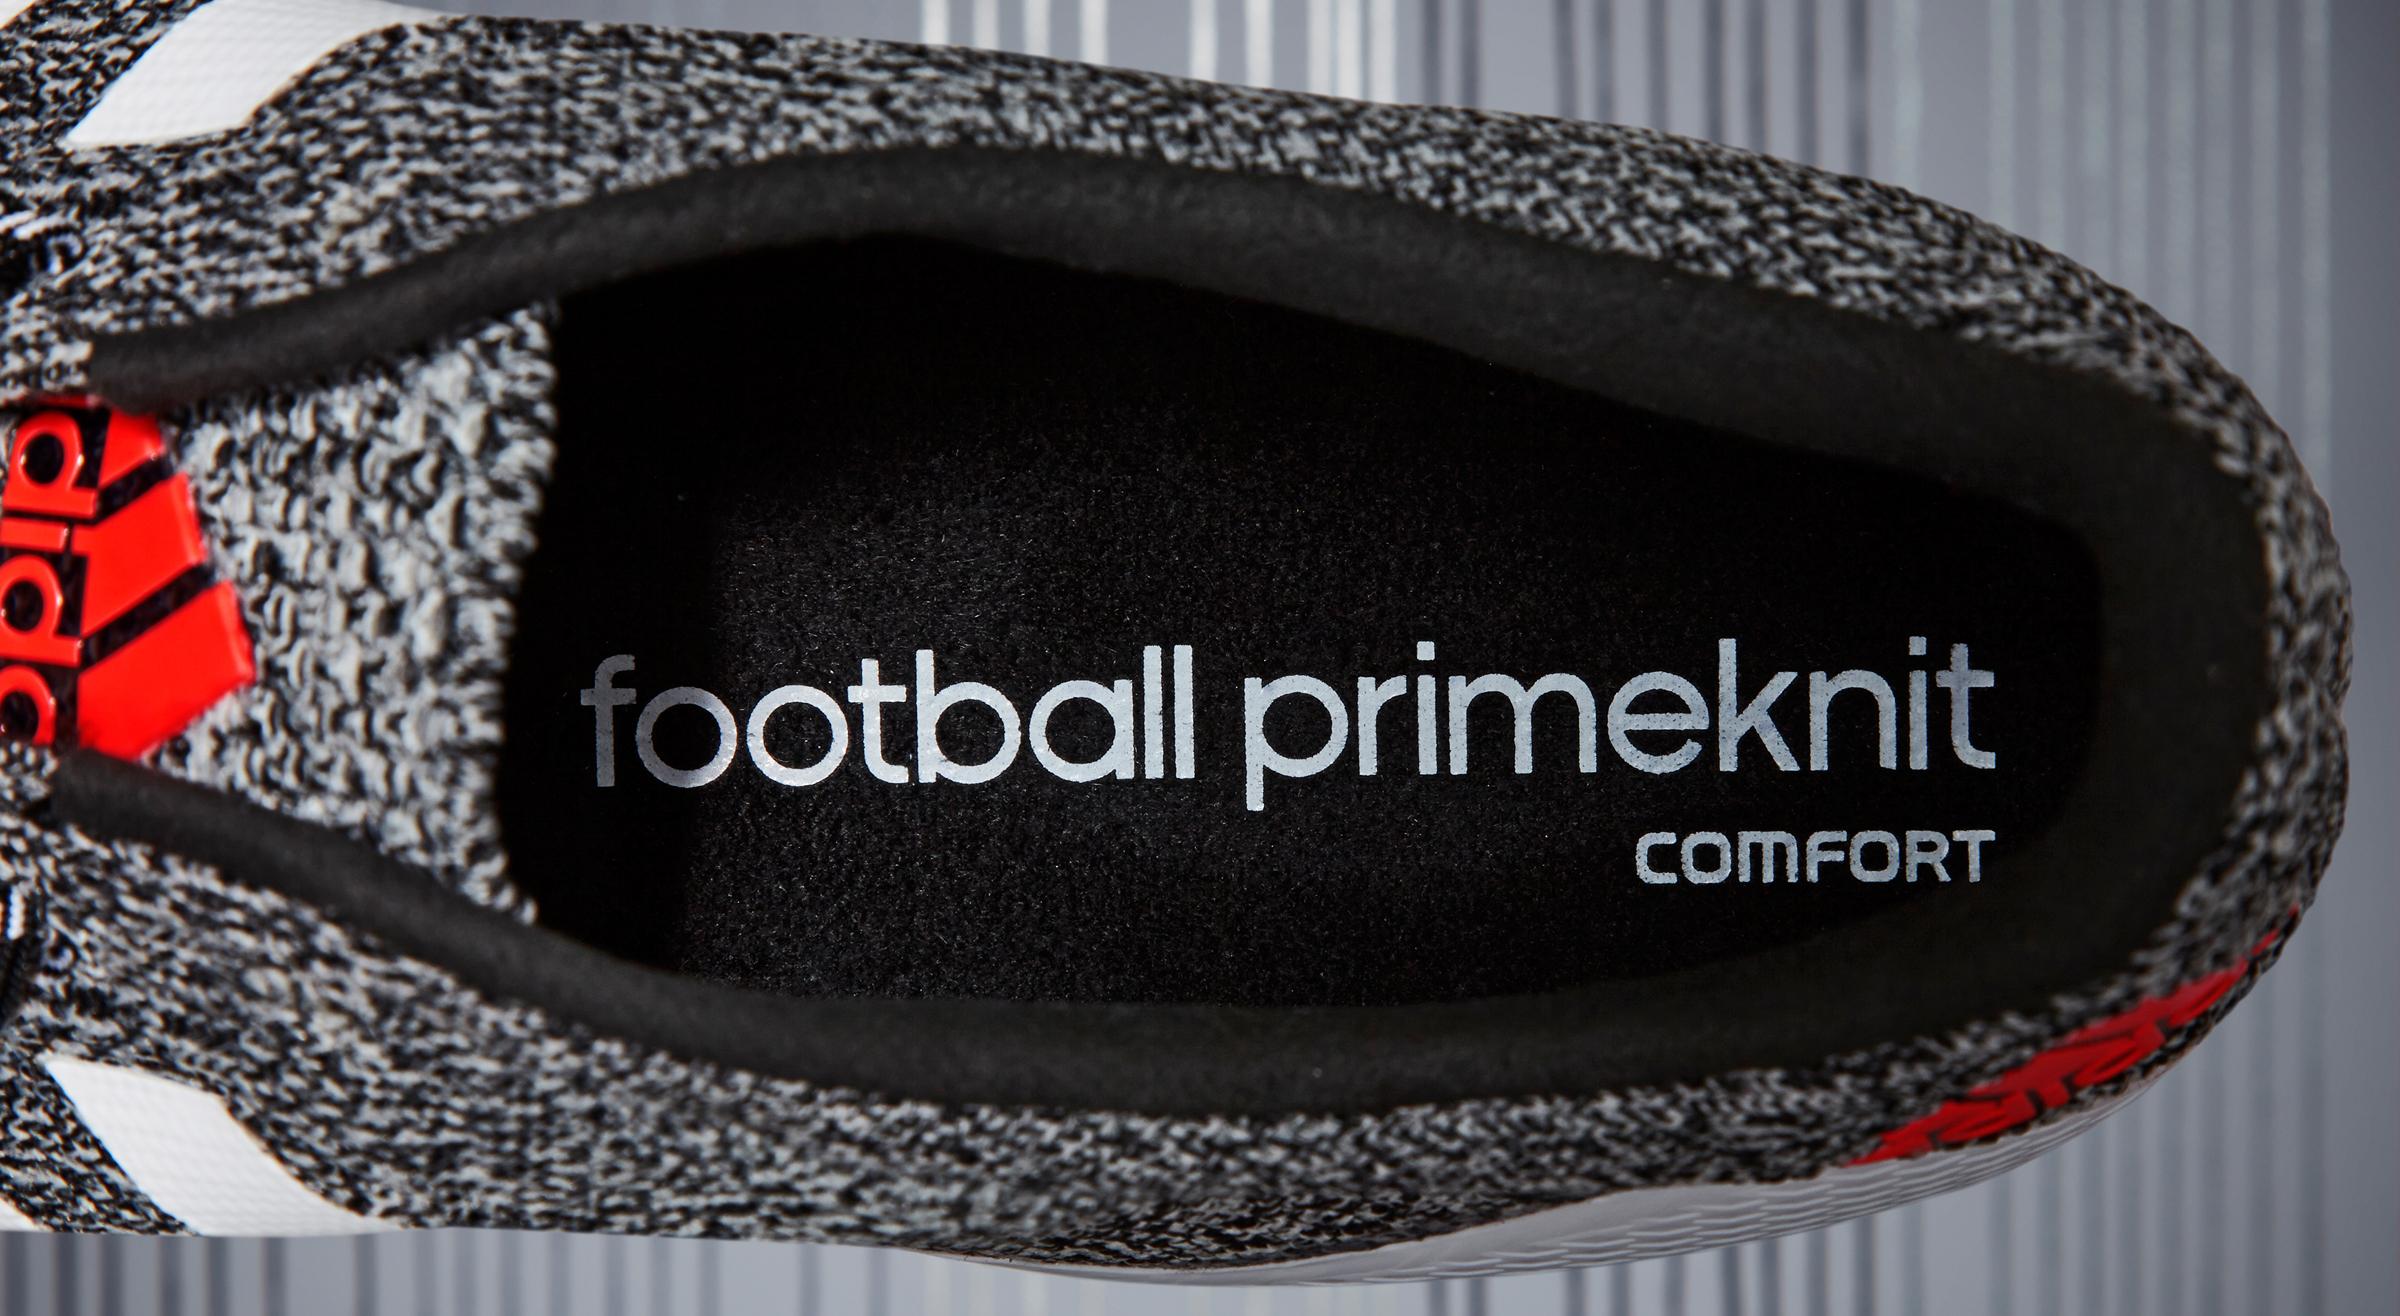 Adidas_Primeknit_PR_Hypersense_07.jpg